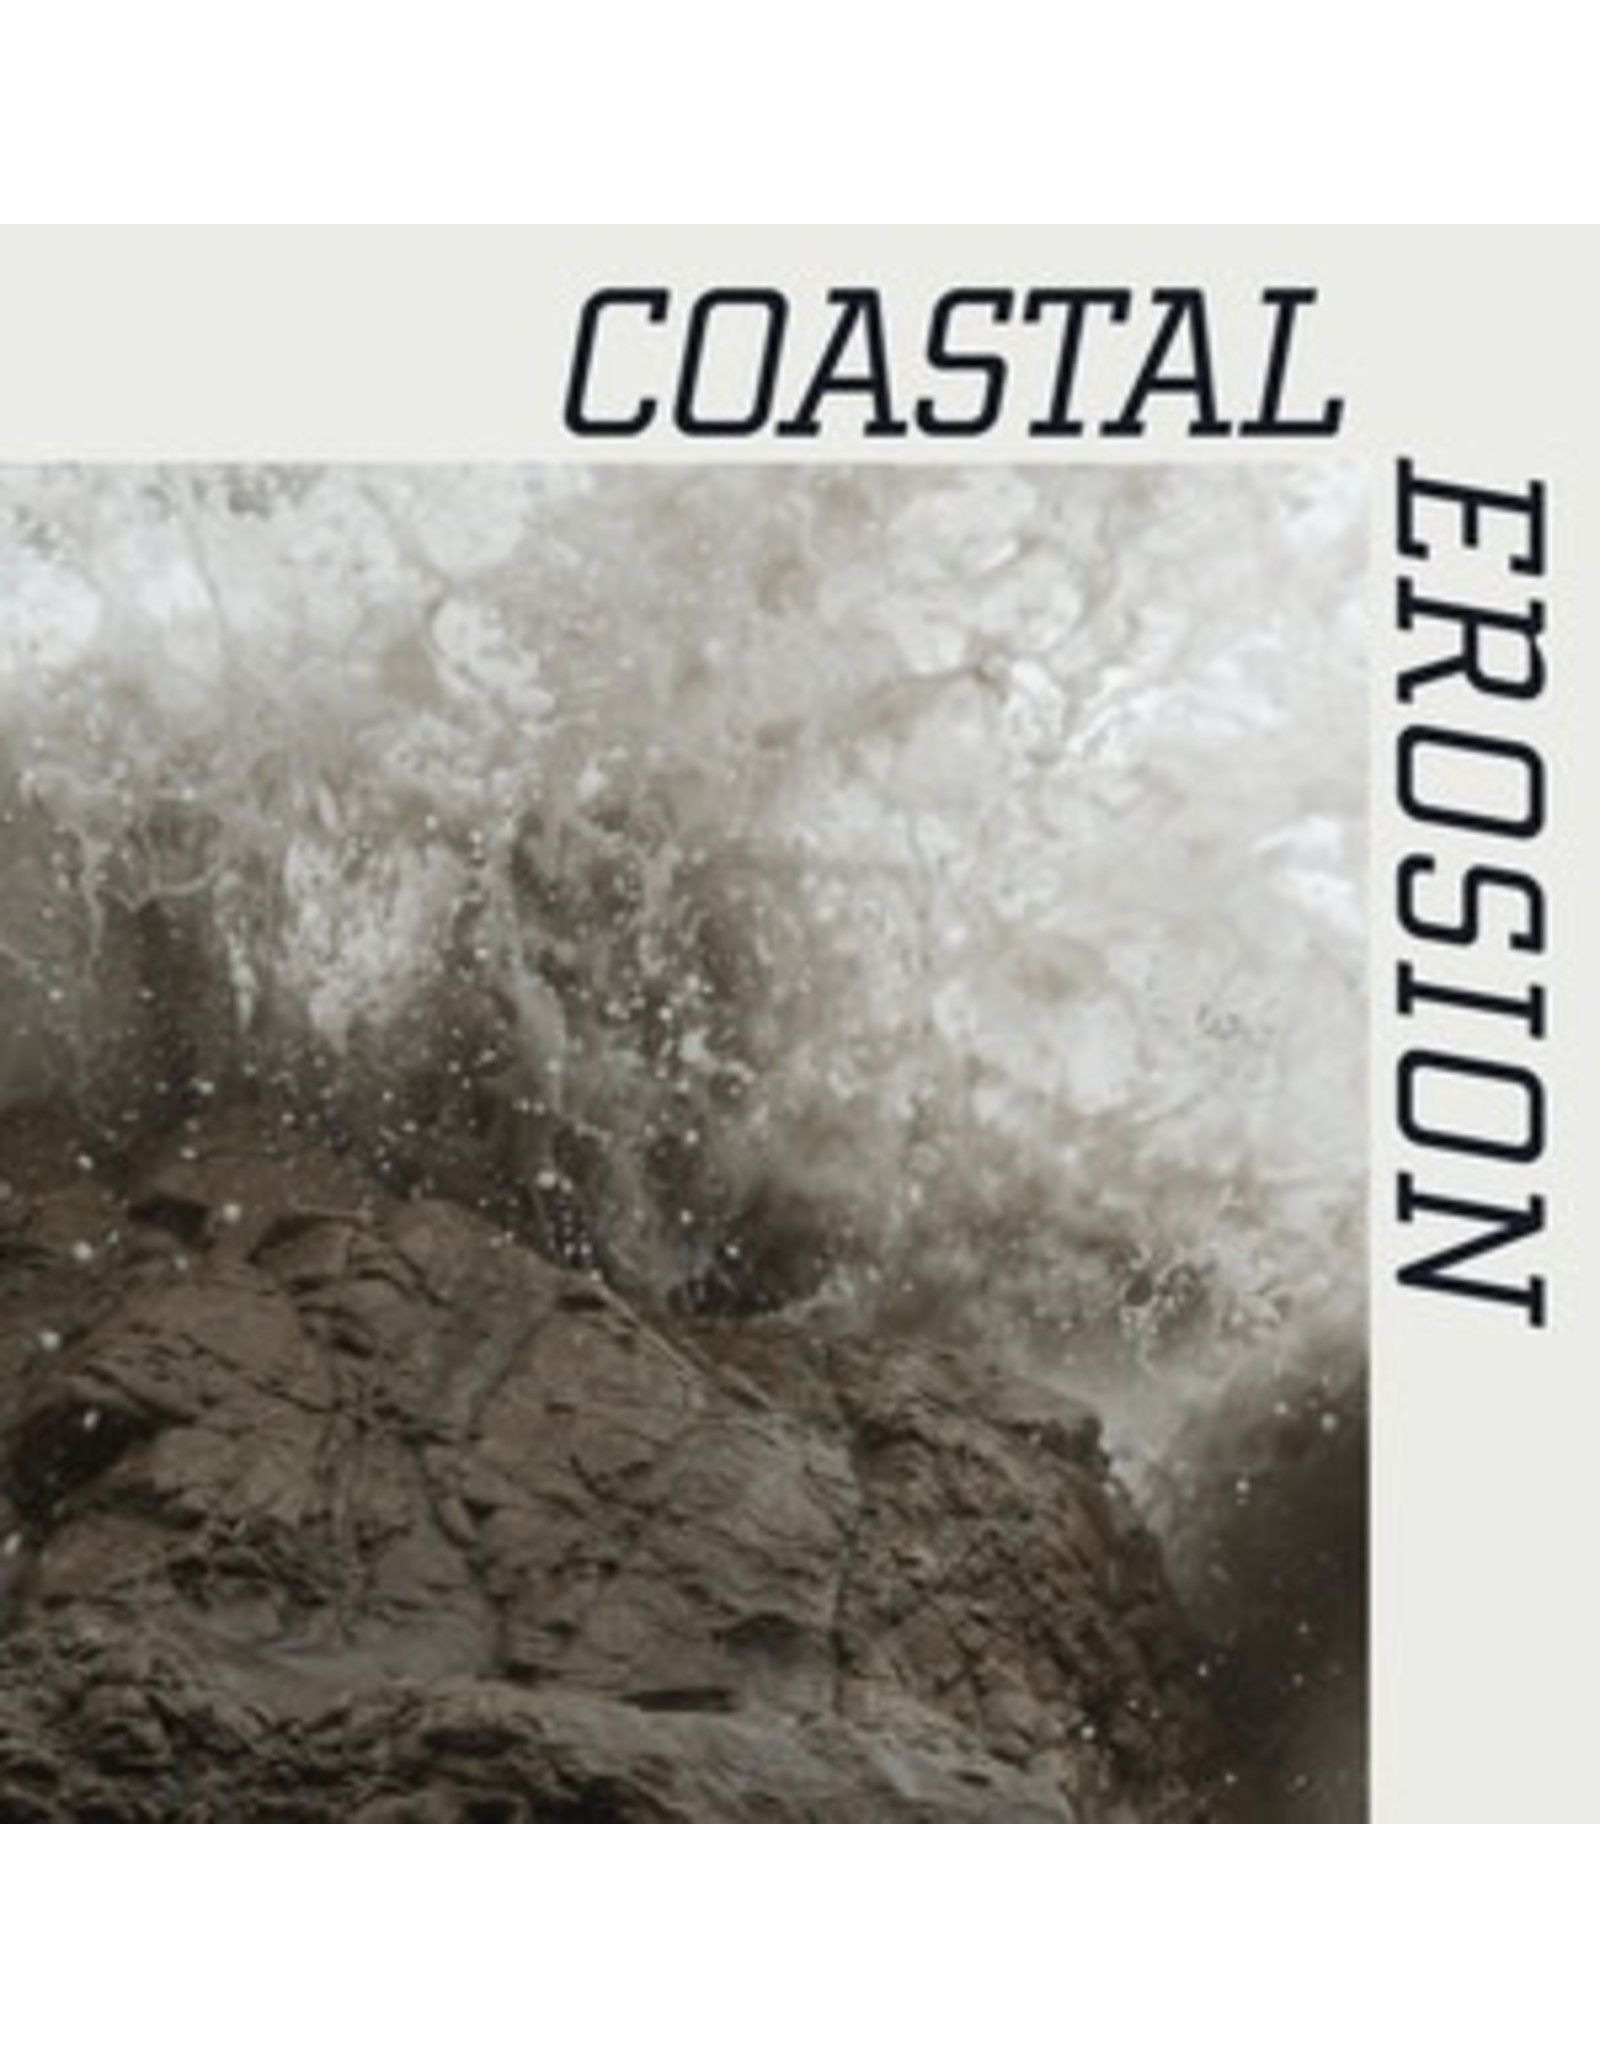 Ideal Merzbow/Vanity Productions: Coastal Erosions  LP